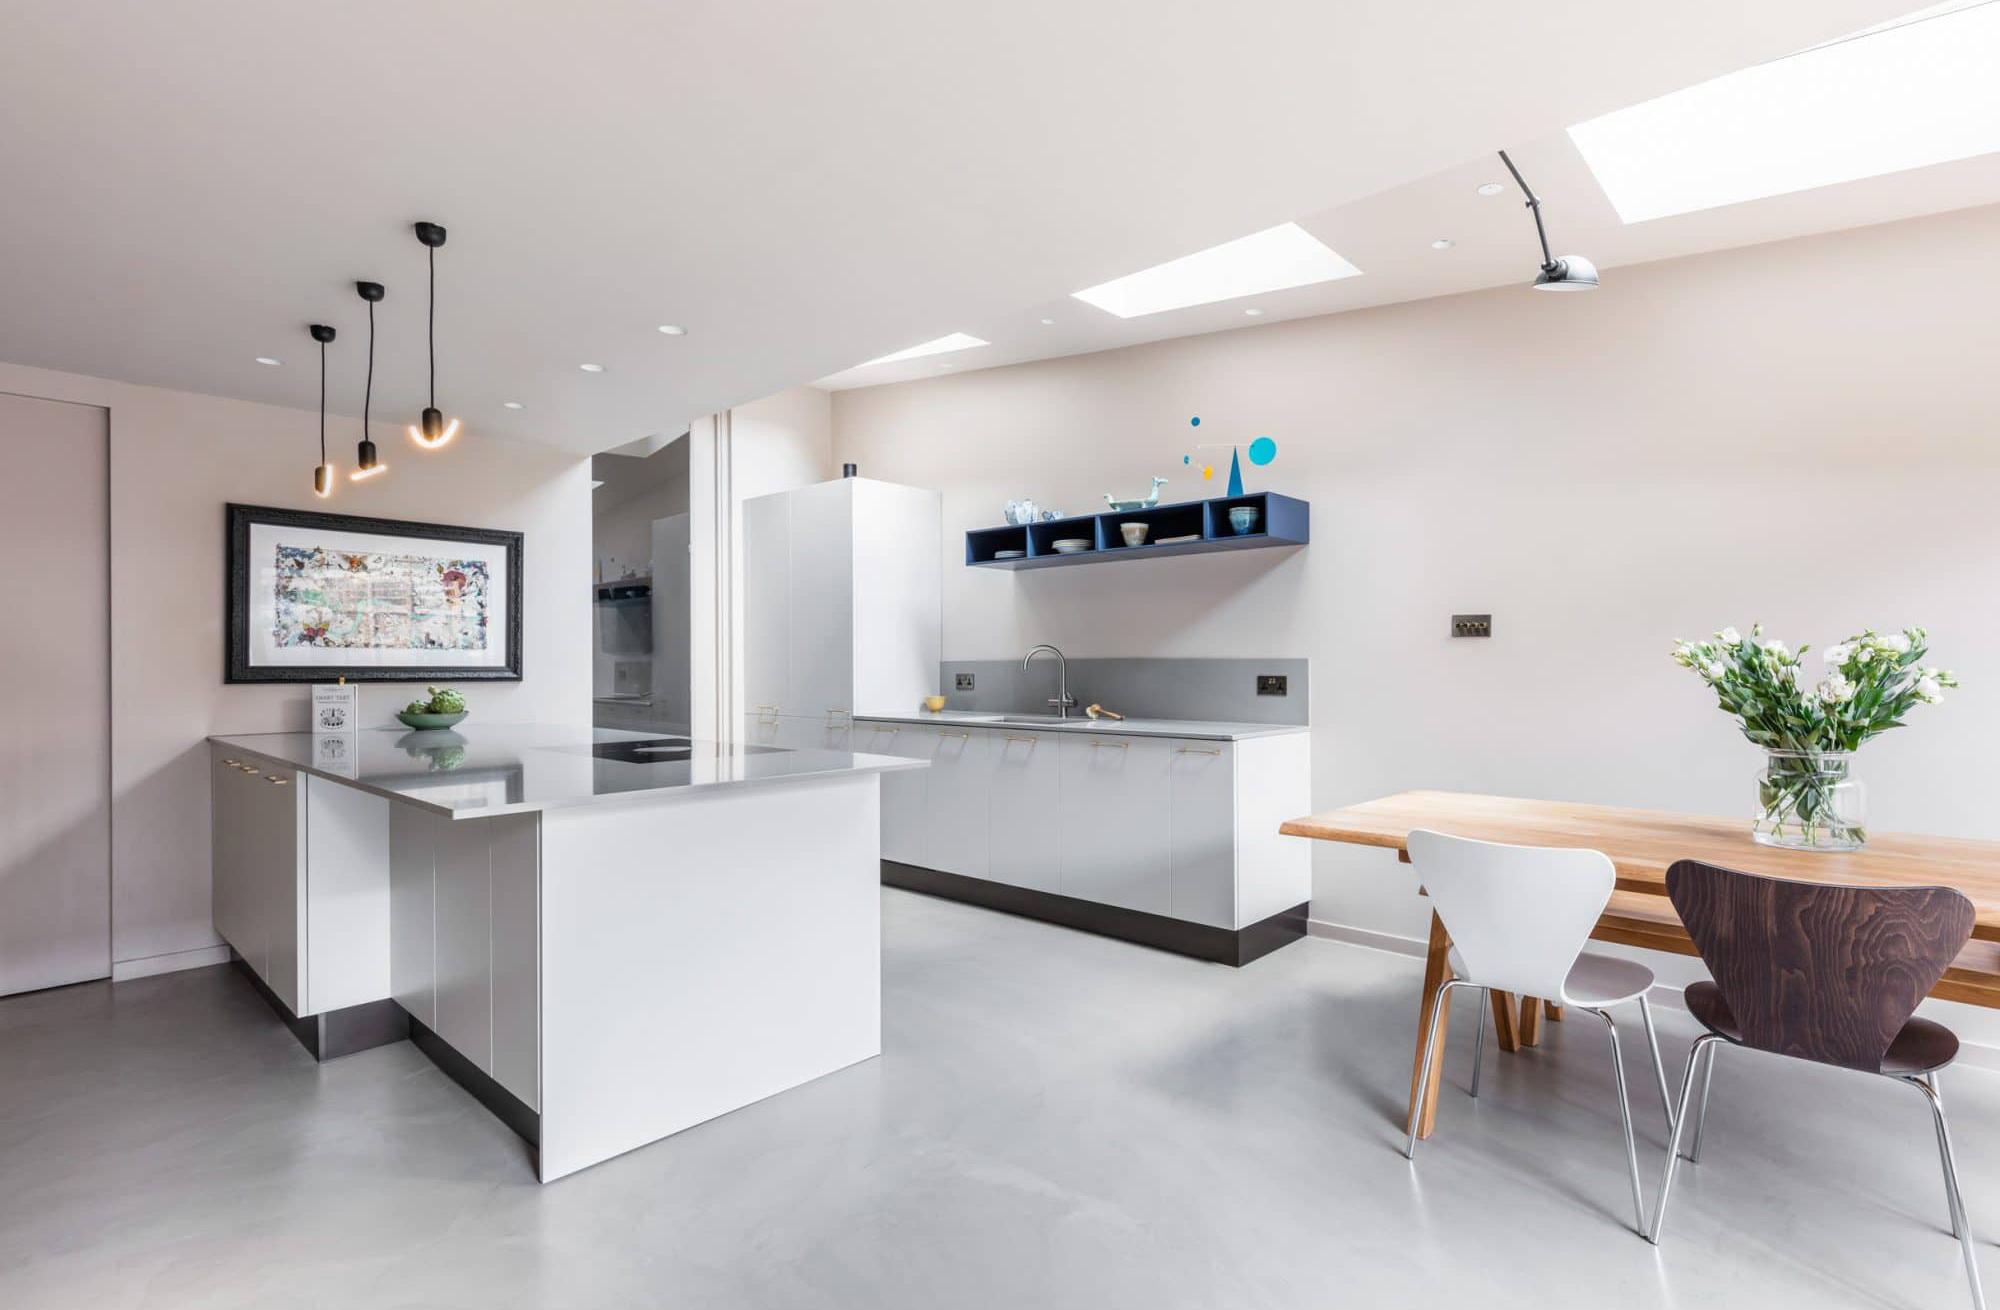 Ari Studio Italian kitchens